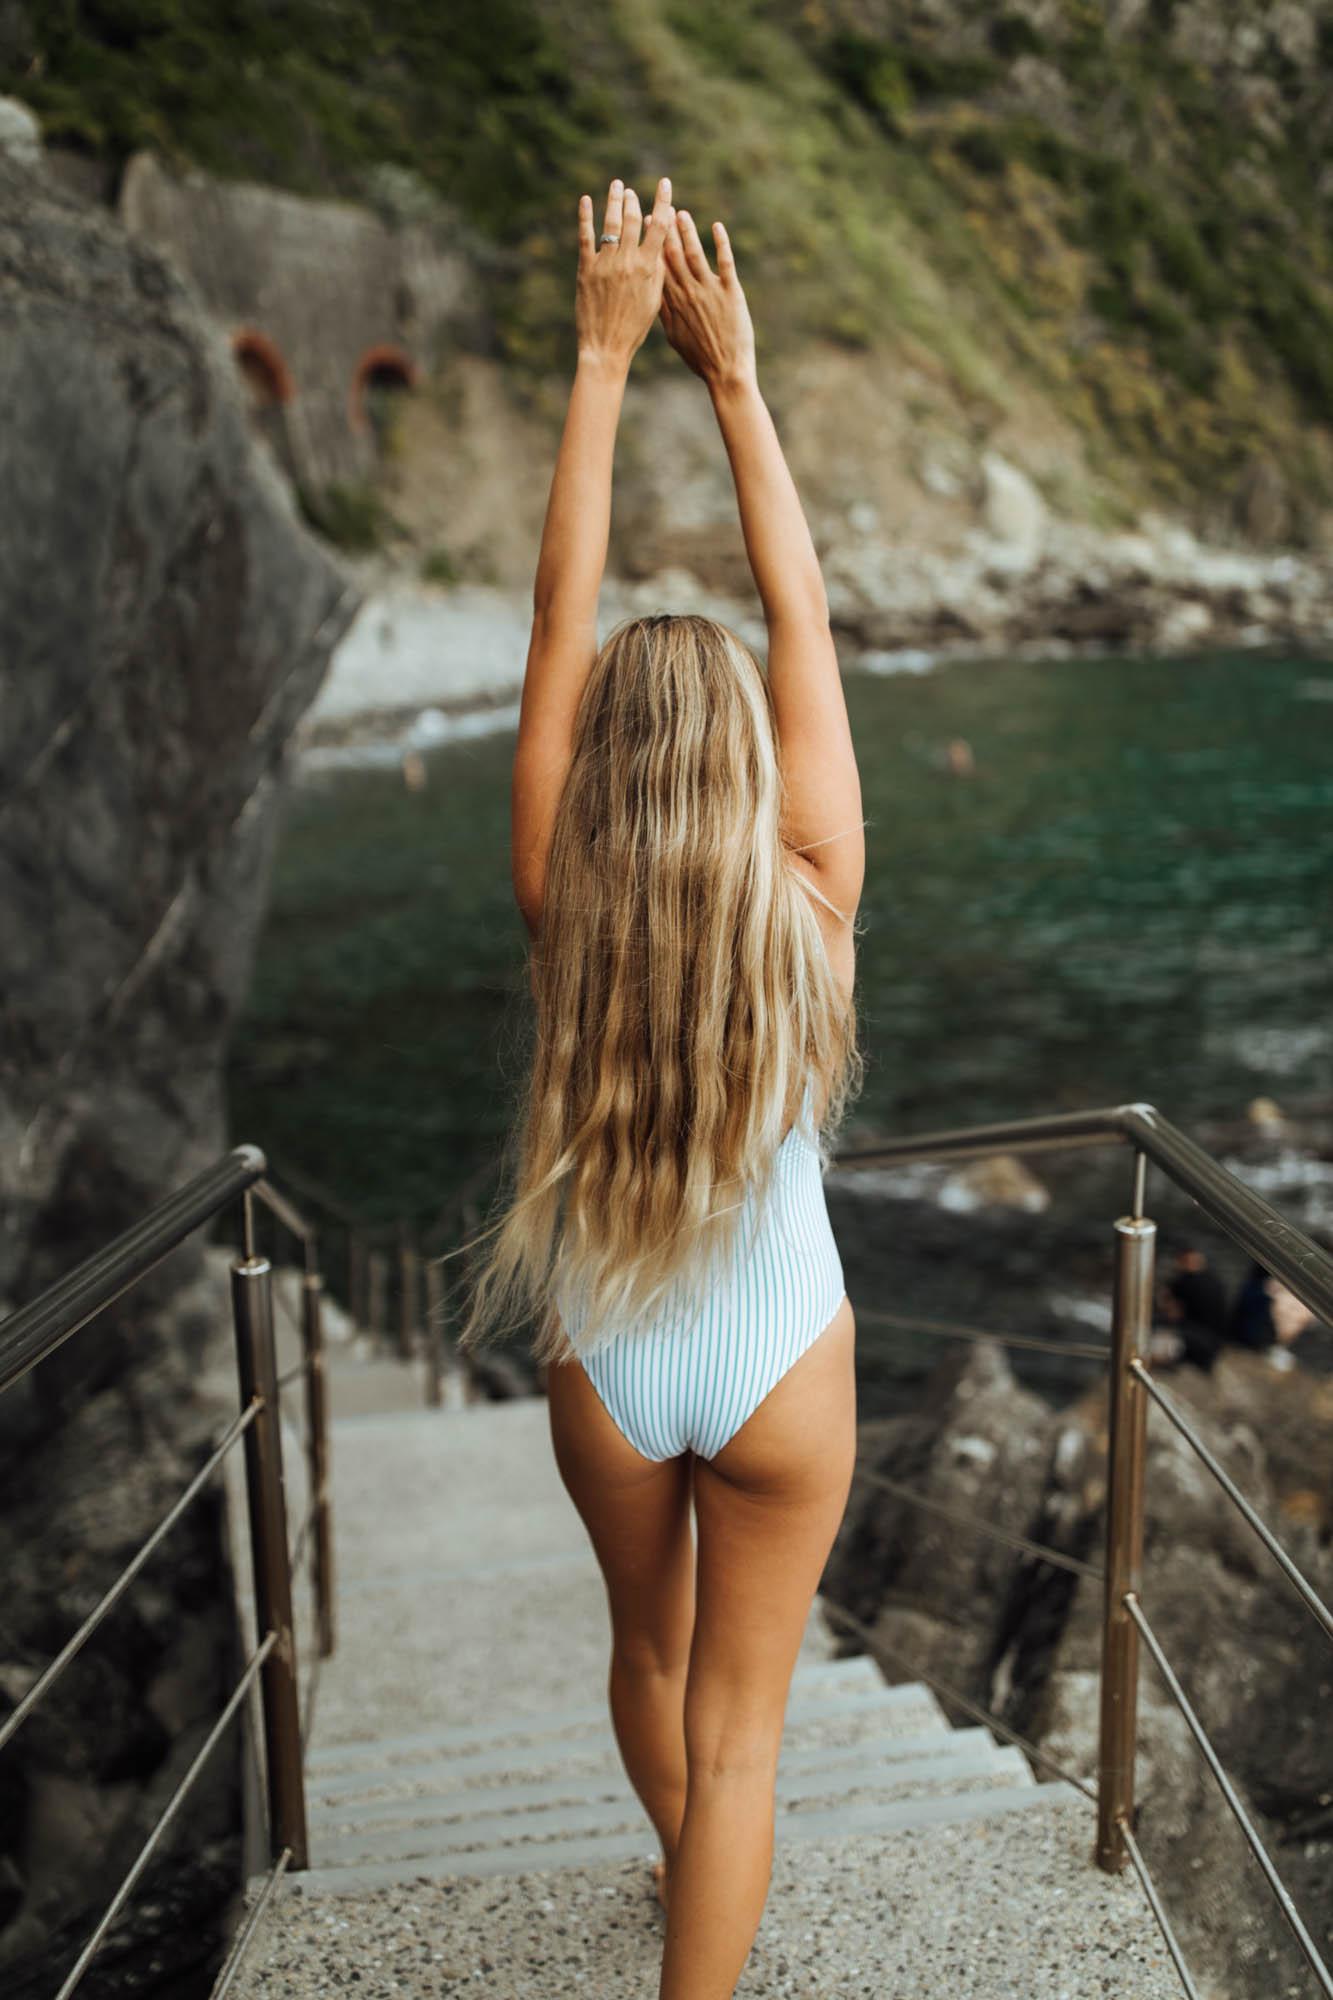 Swimsuit from Rhythm